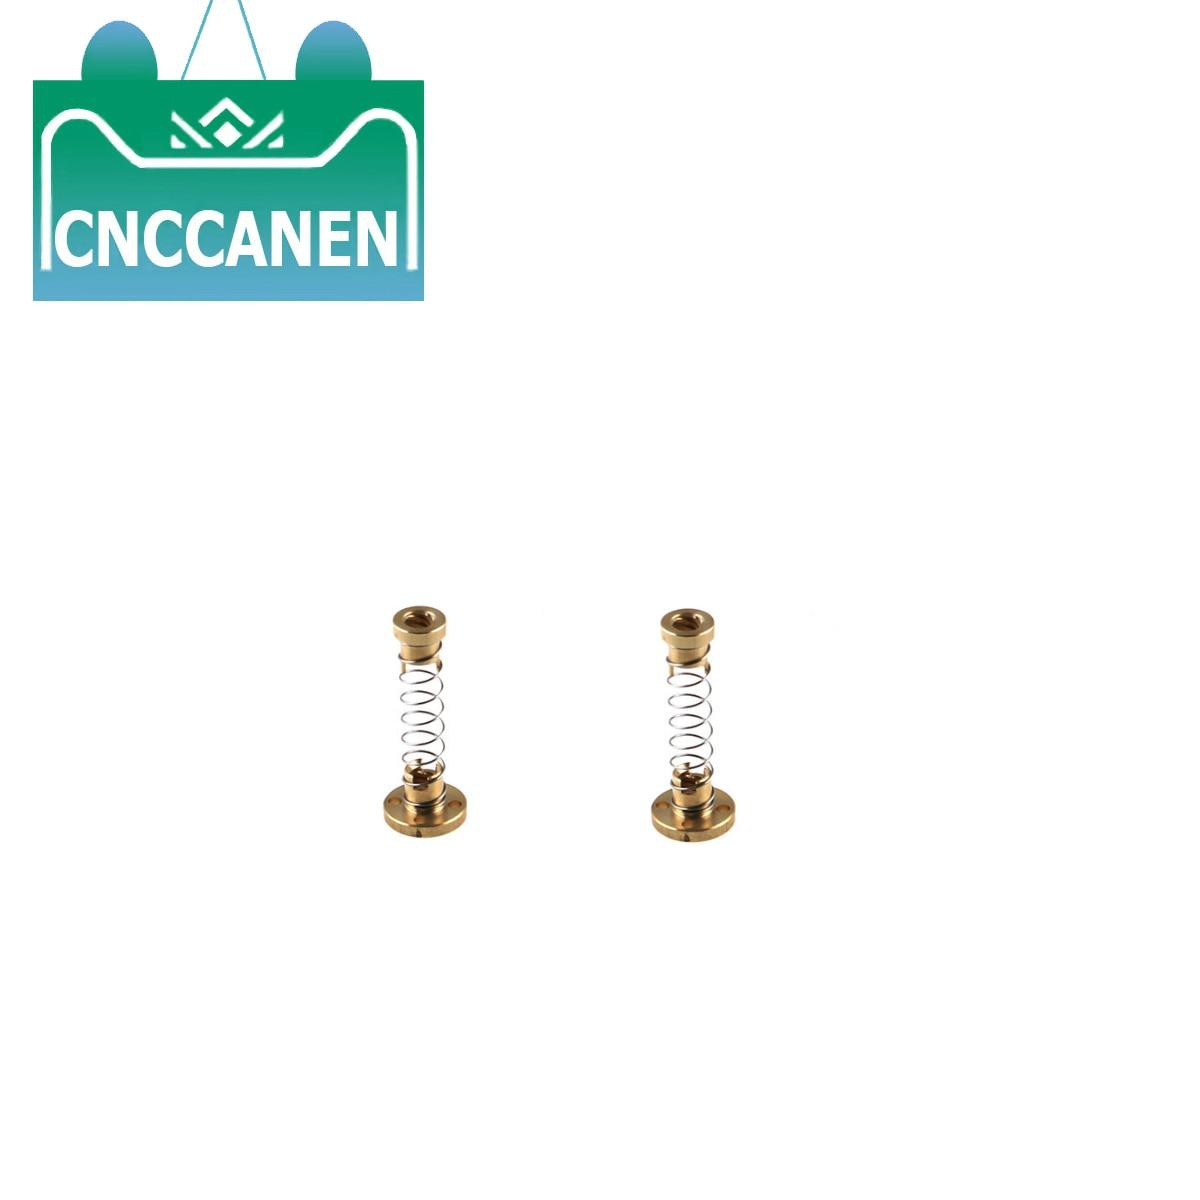 10PCS a lot 8mm Lock Collar Block for 3D printer Openbuilds T8 screw rod